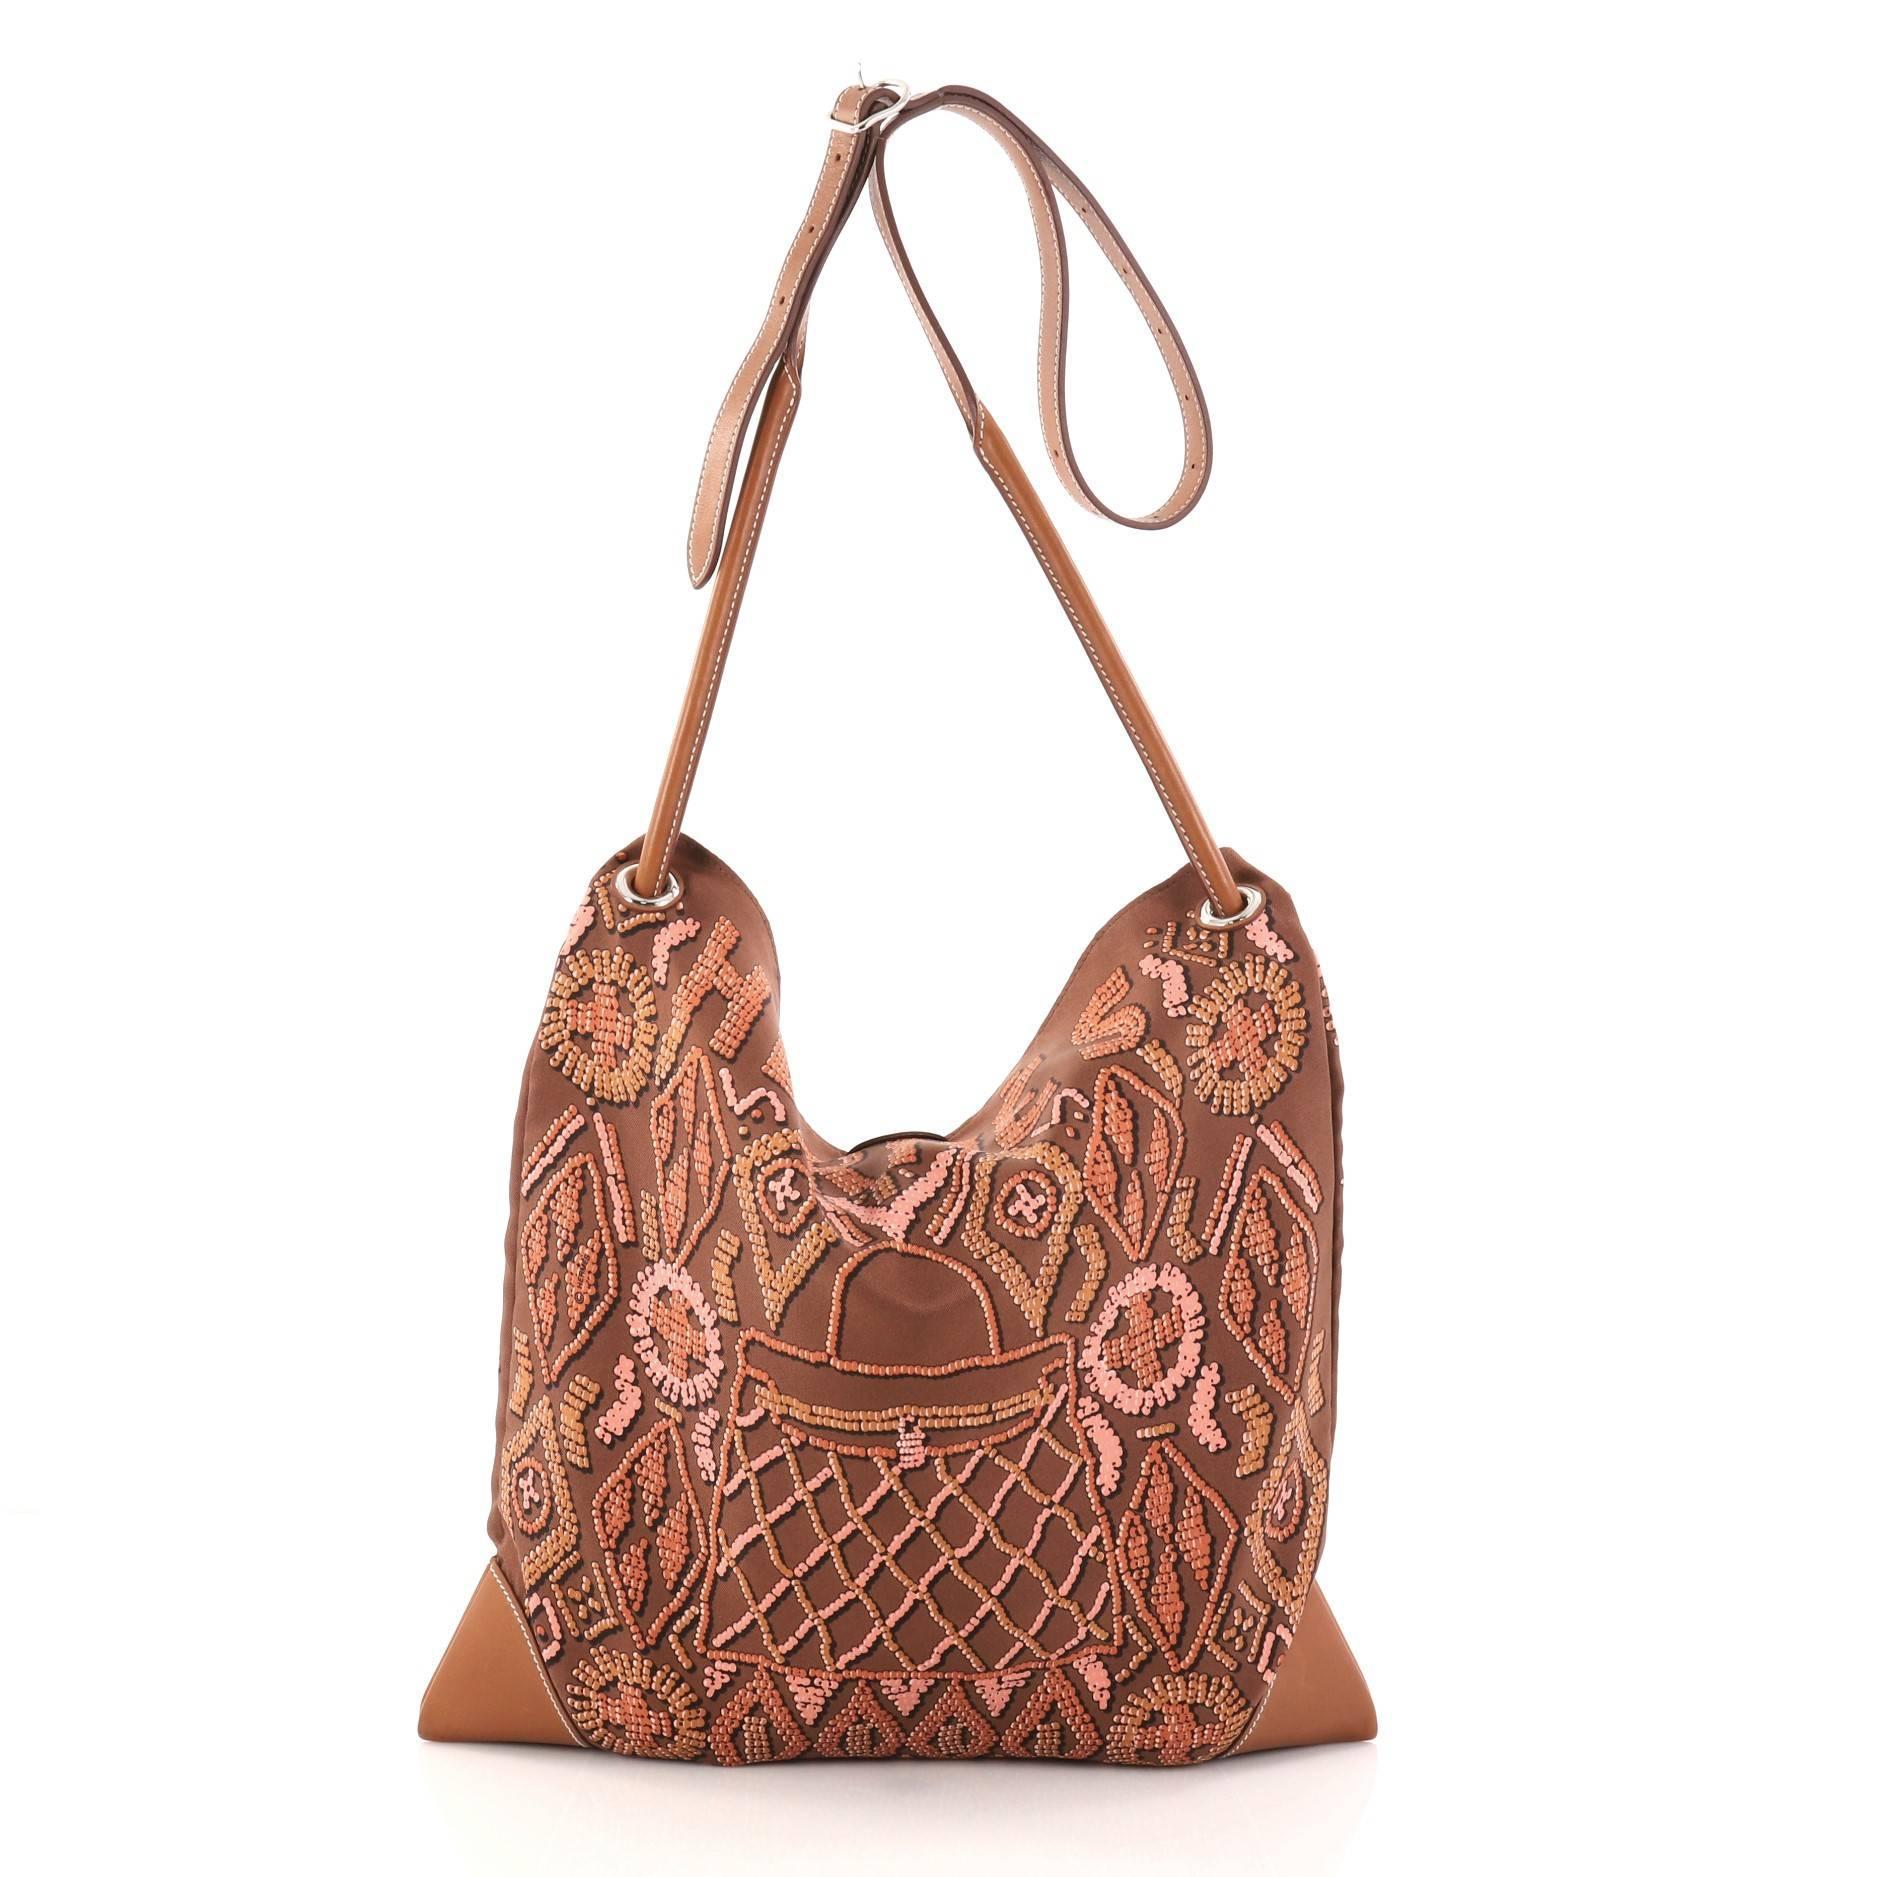 1943ee14a5c3 Hermes Silky City Handbag Printed Silk and Leather PM at 1stdibs